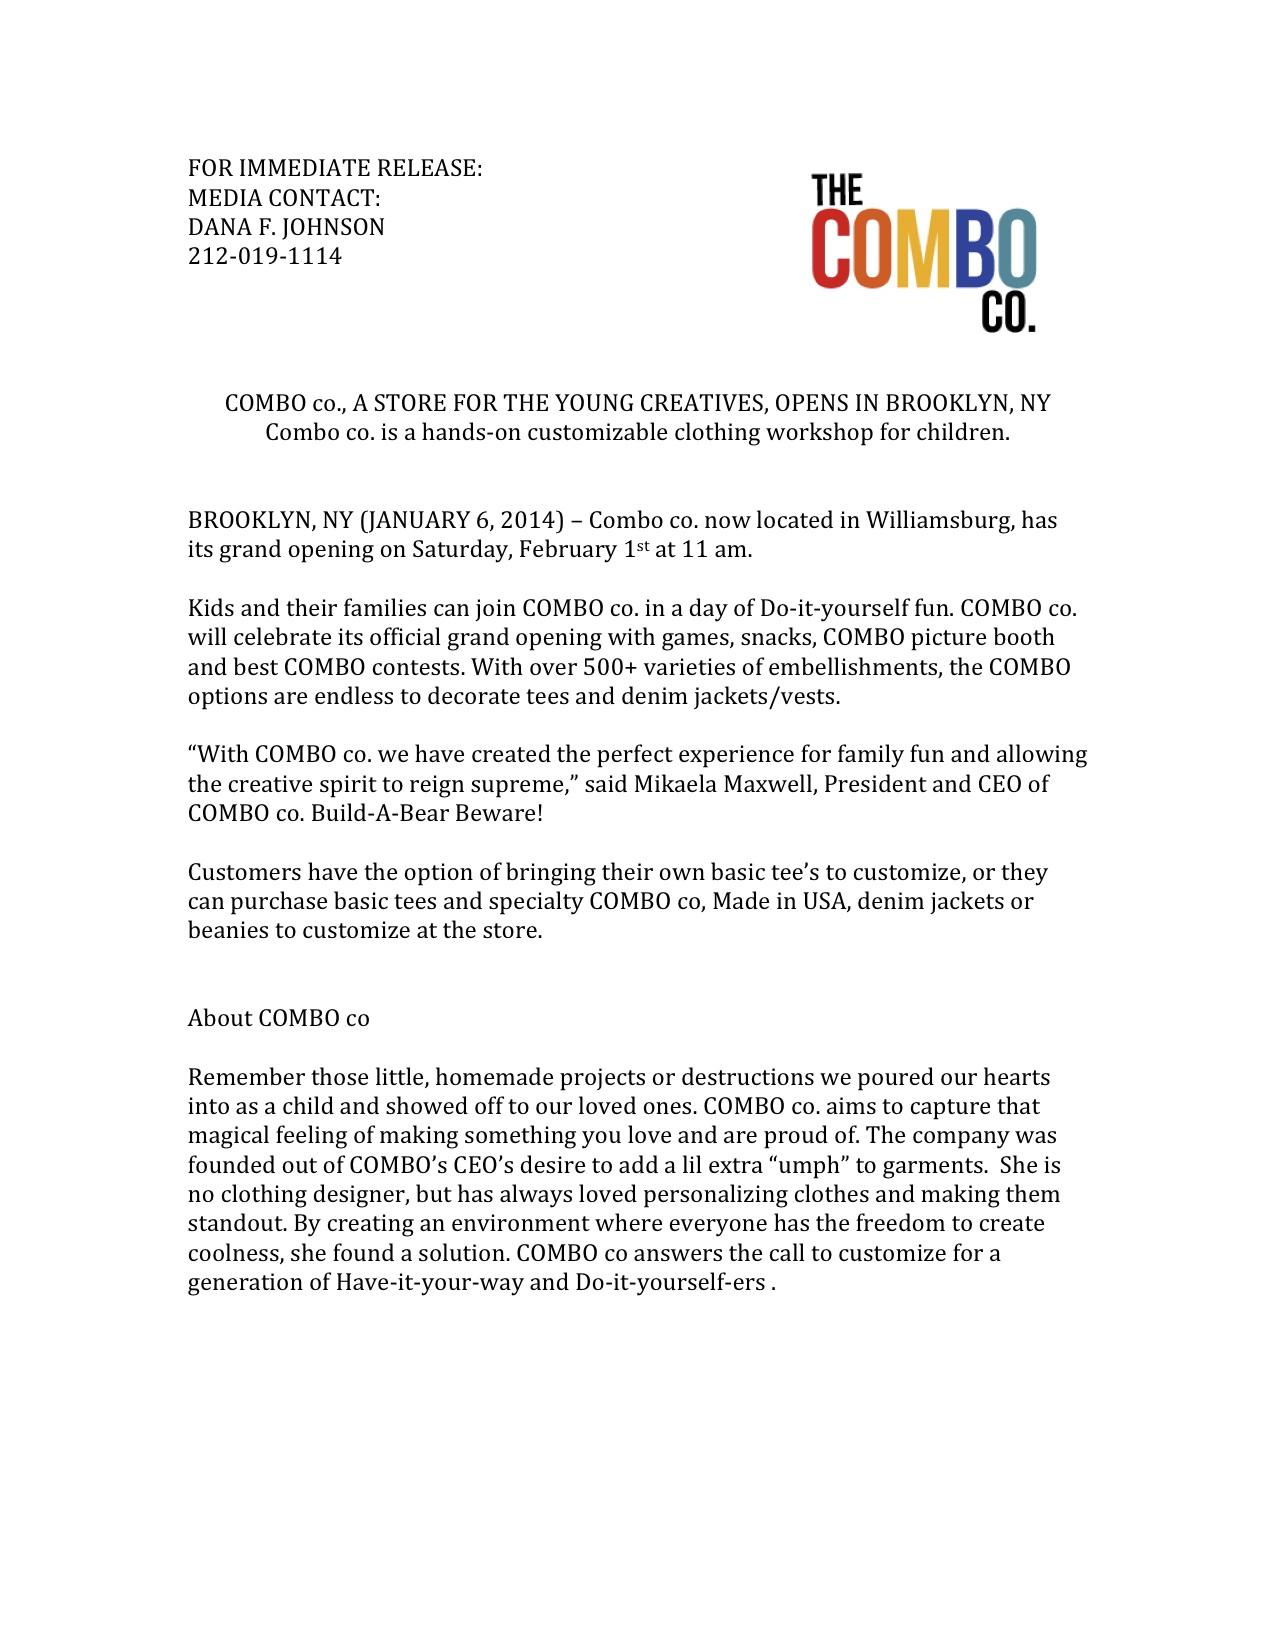 combo grand opening press release.jpg